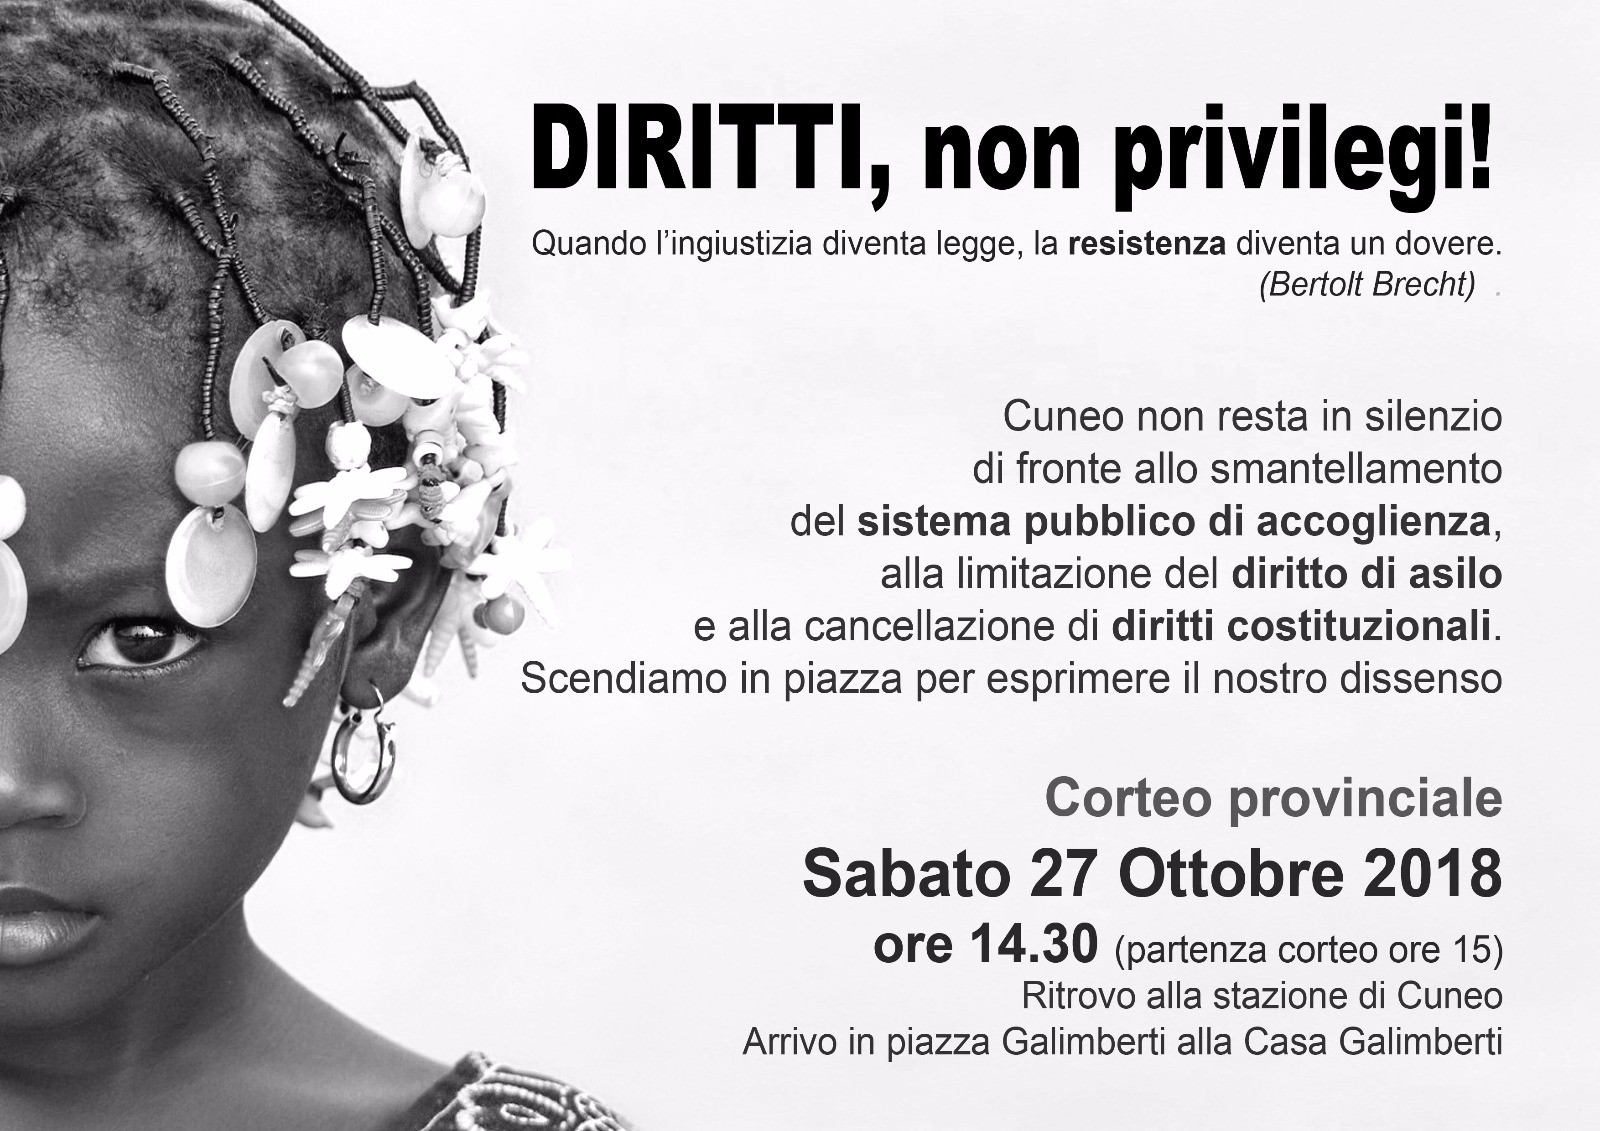 Cuneo 27 ottobre 2018